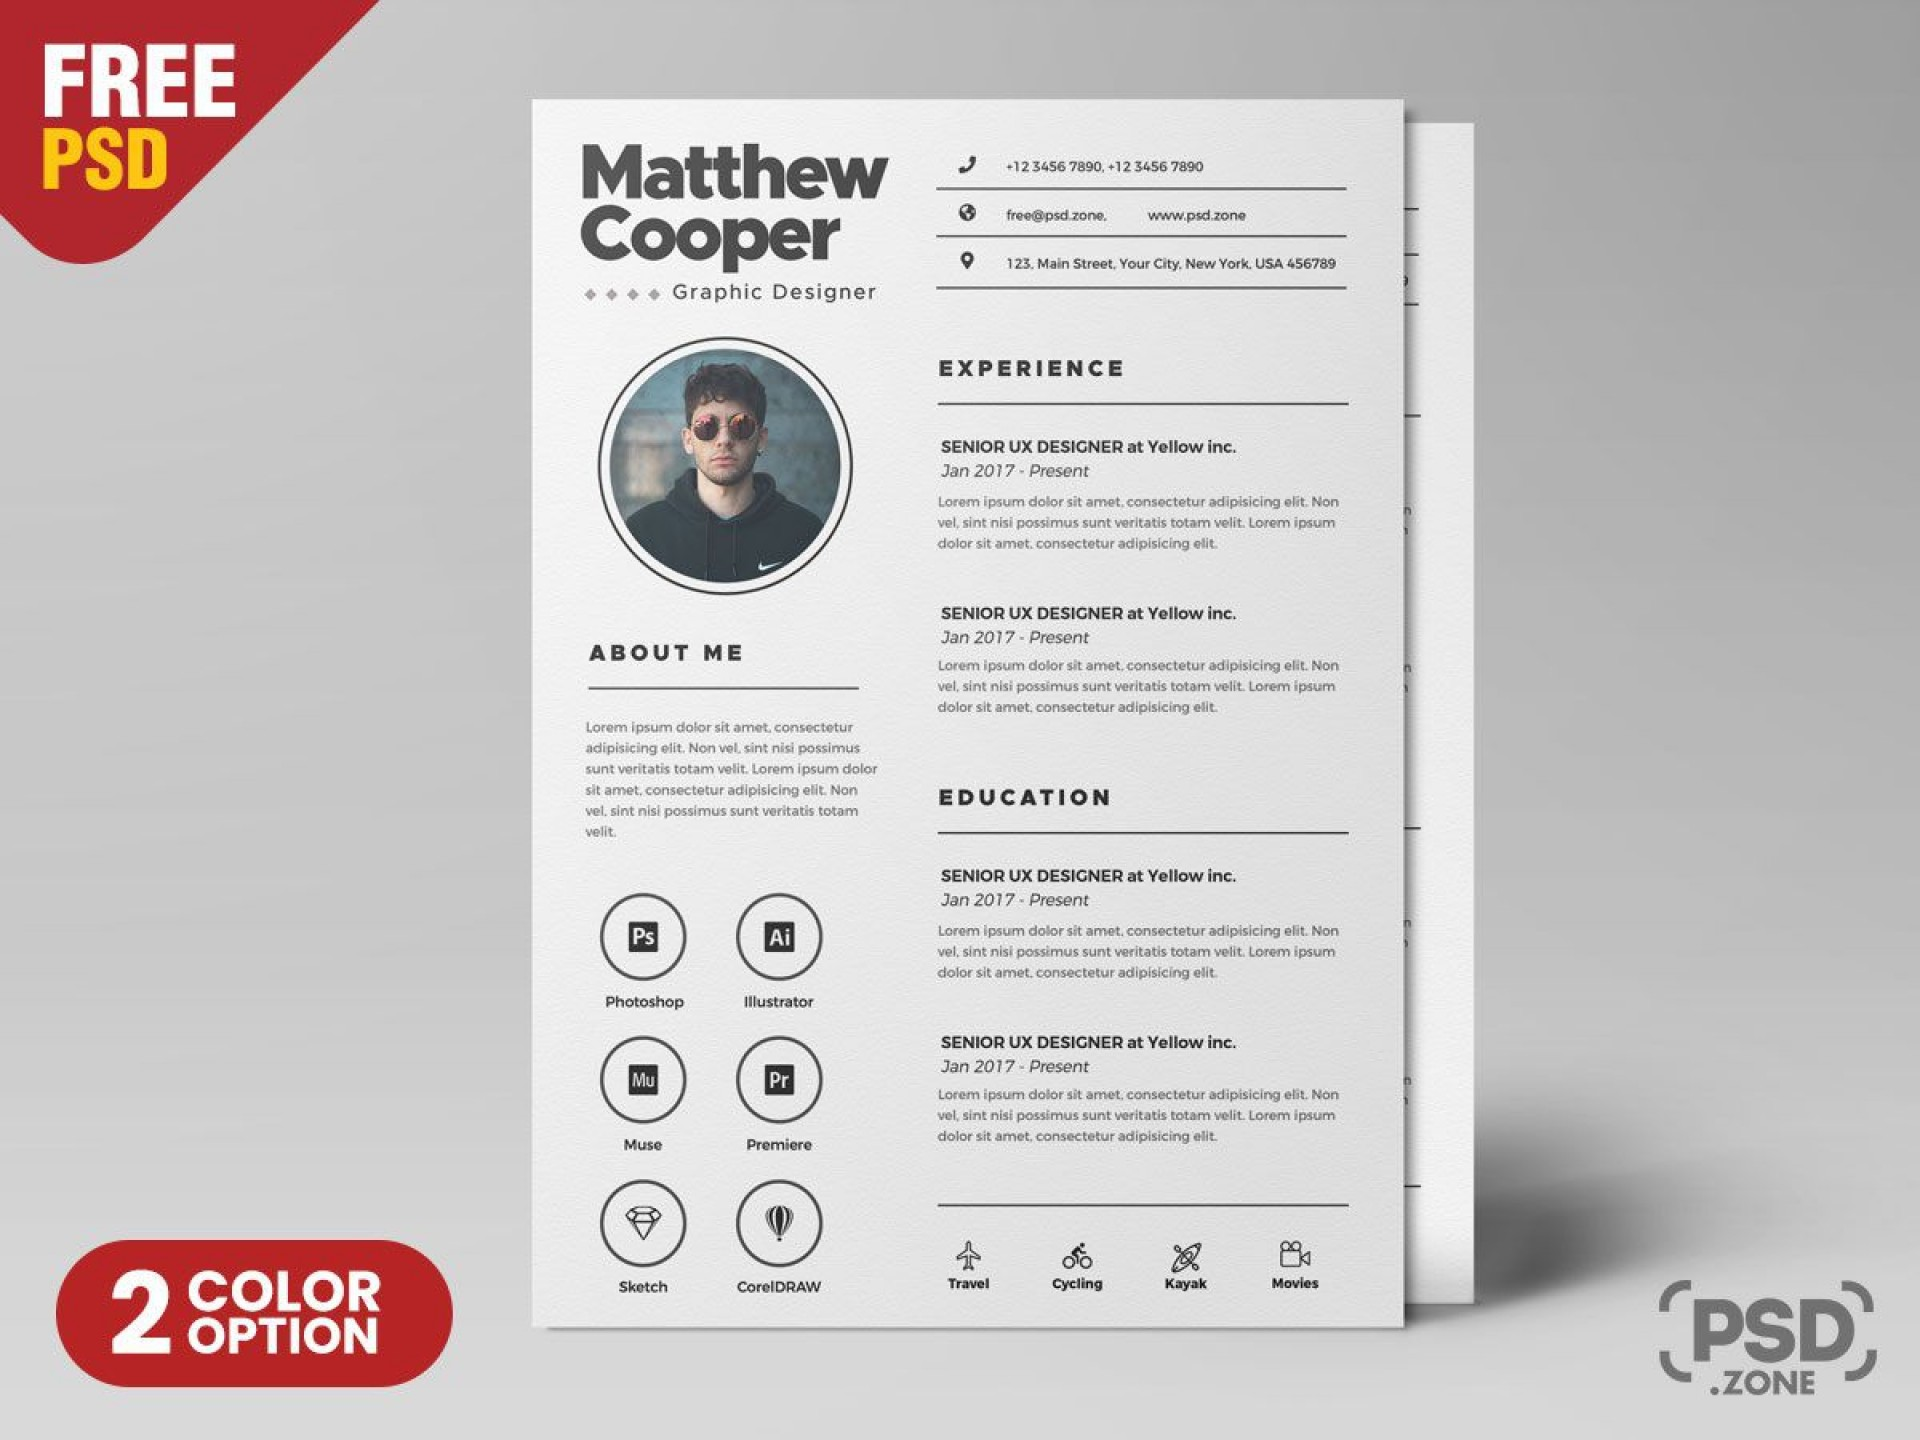 002 Unusual Free Psd Resume Template Design  Templates Attractive Download Creative (psd Id) Curriculum Vitae1920